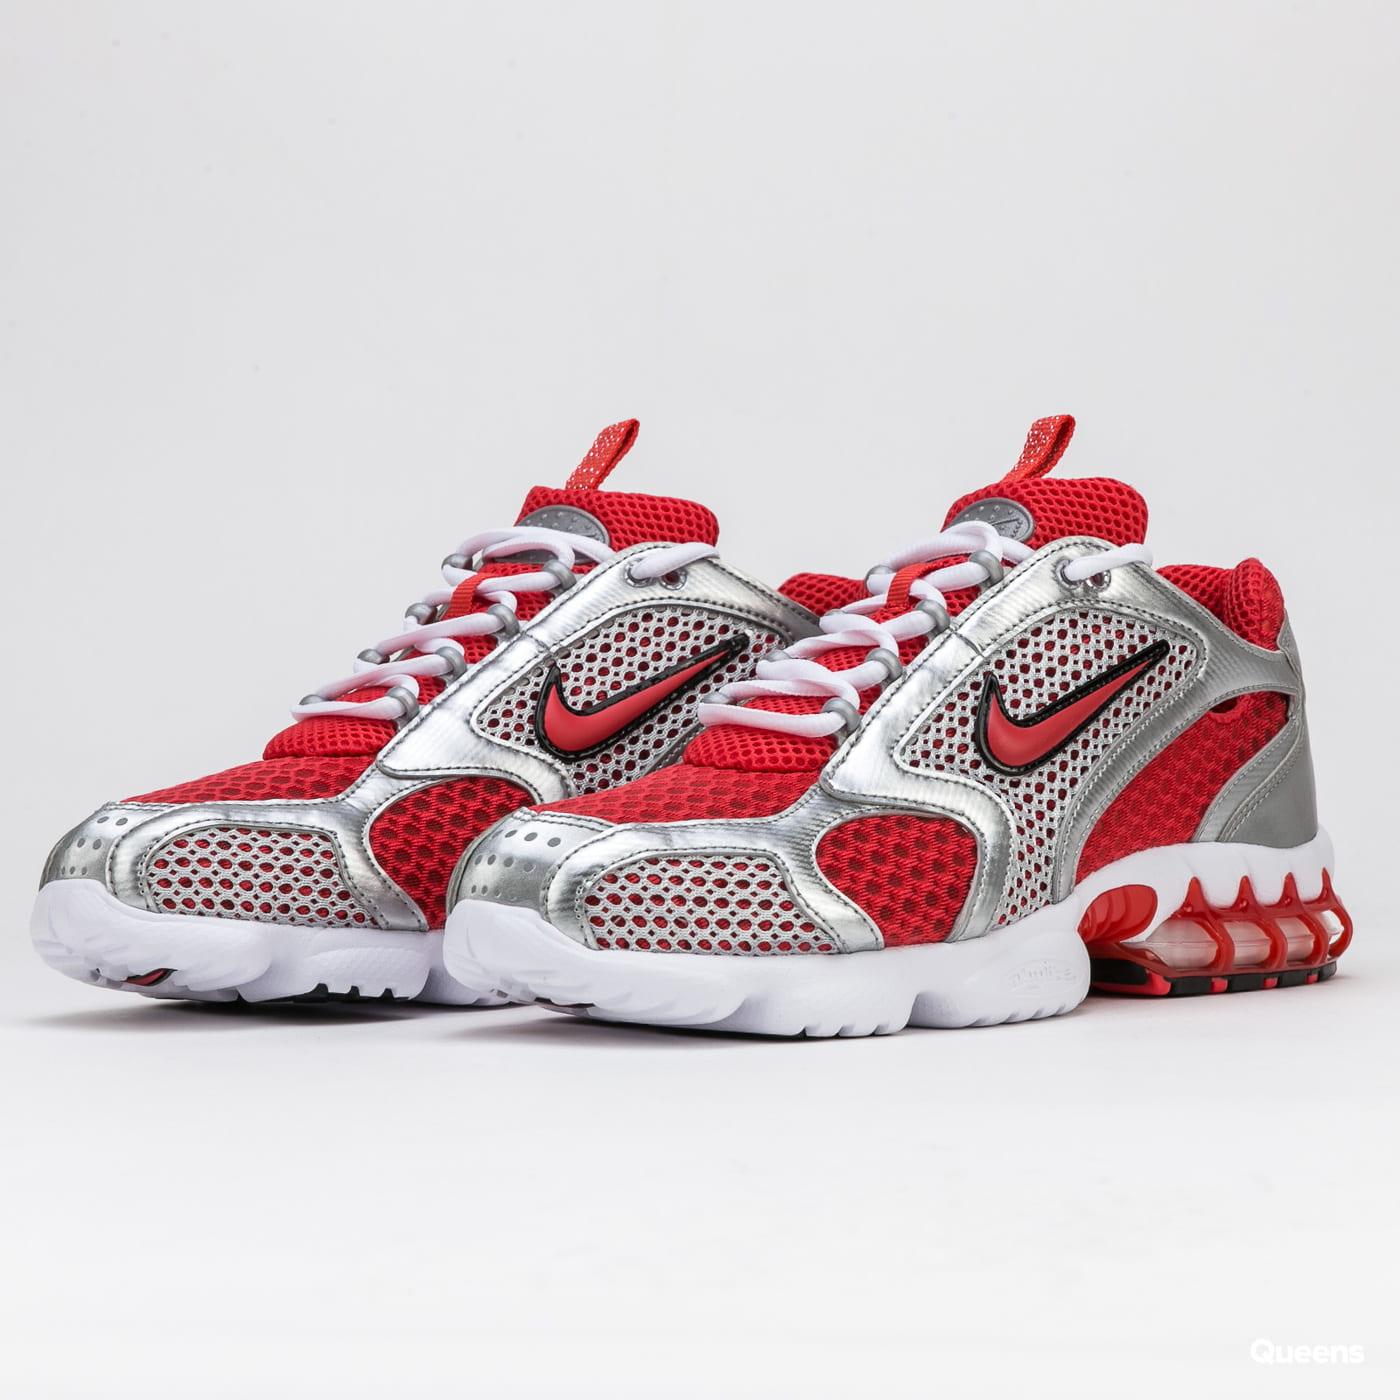 Baskets Nike Air Zoom Spiridon Cage 2